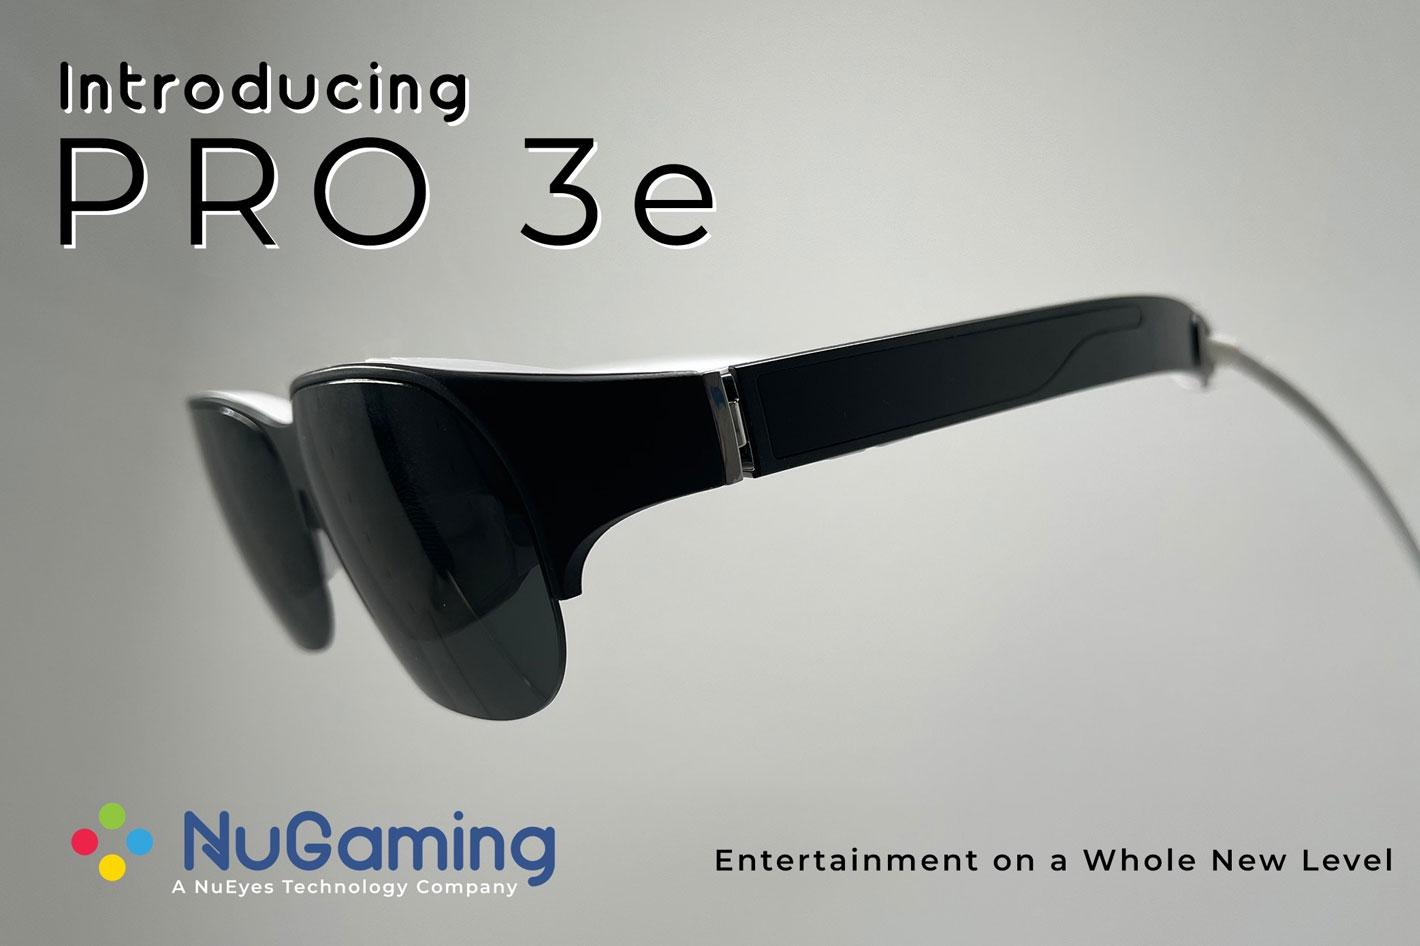 NuEyes面向玩家推出可支持5G的AR眼镜NuGaming Pro 3e